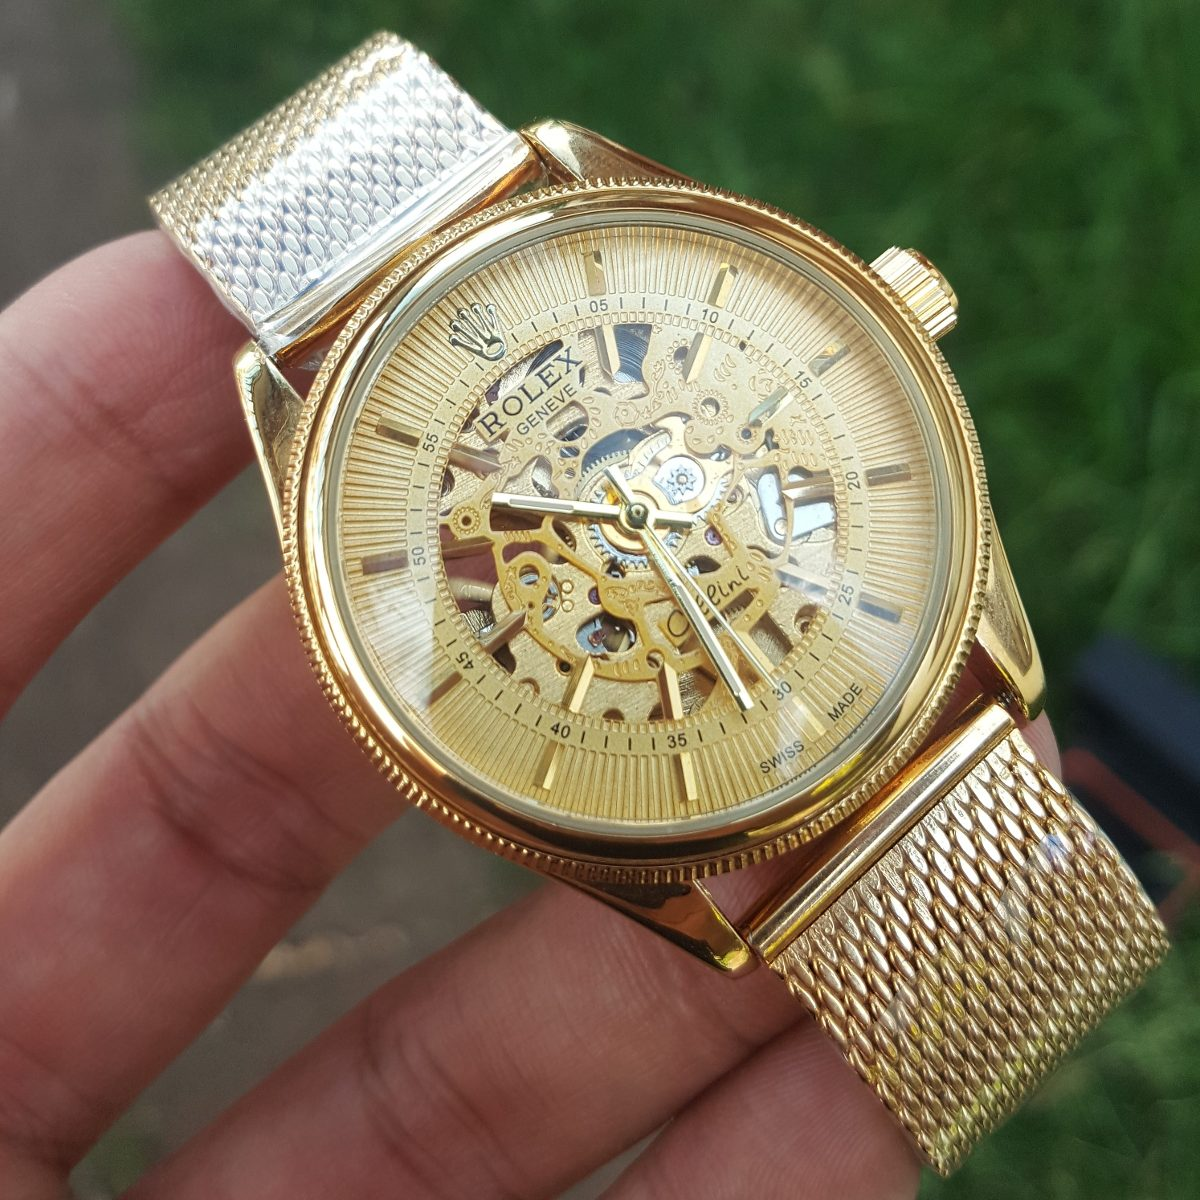 6ecb48e55ca Reloj Rolex Automatico Corazon Abierto R.n23 -   145.000 en Mercado ...